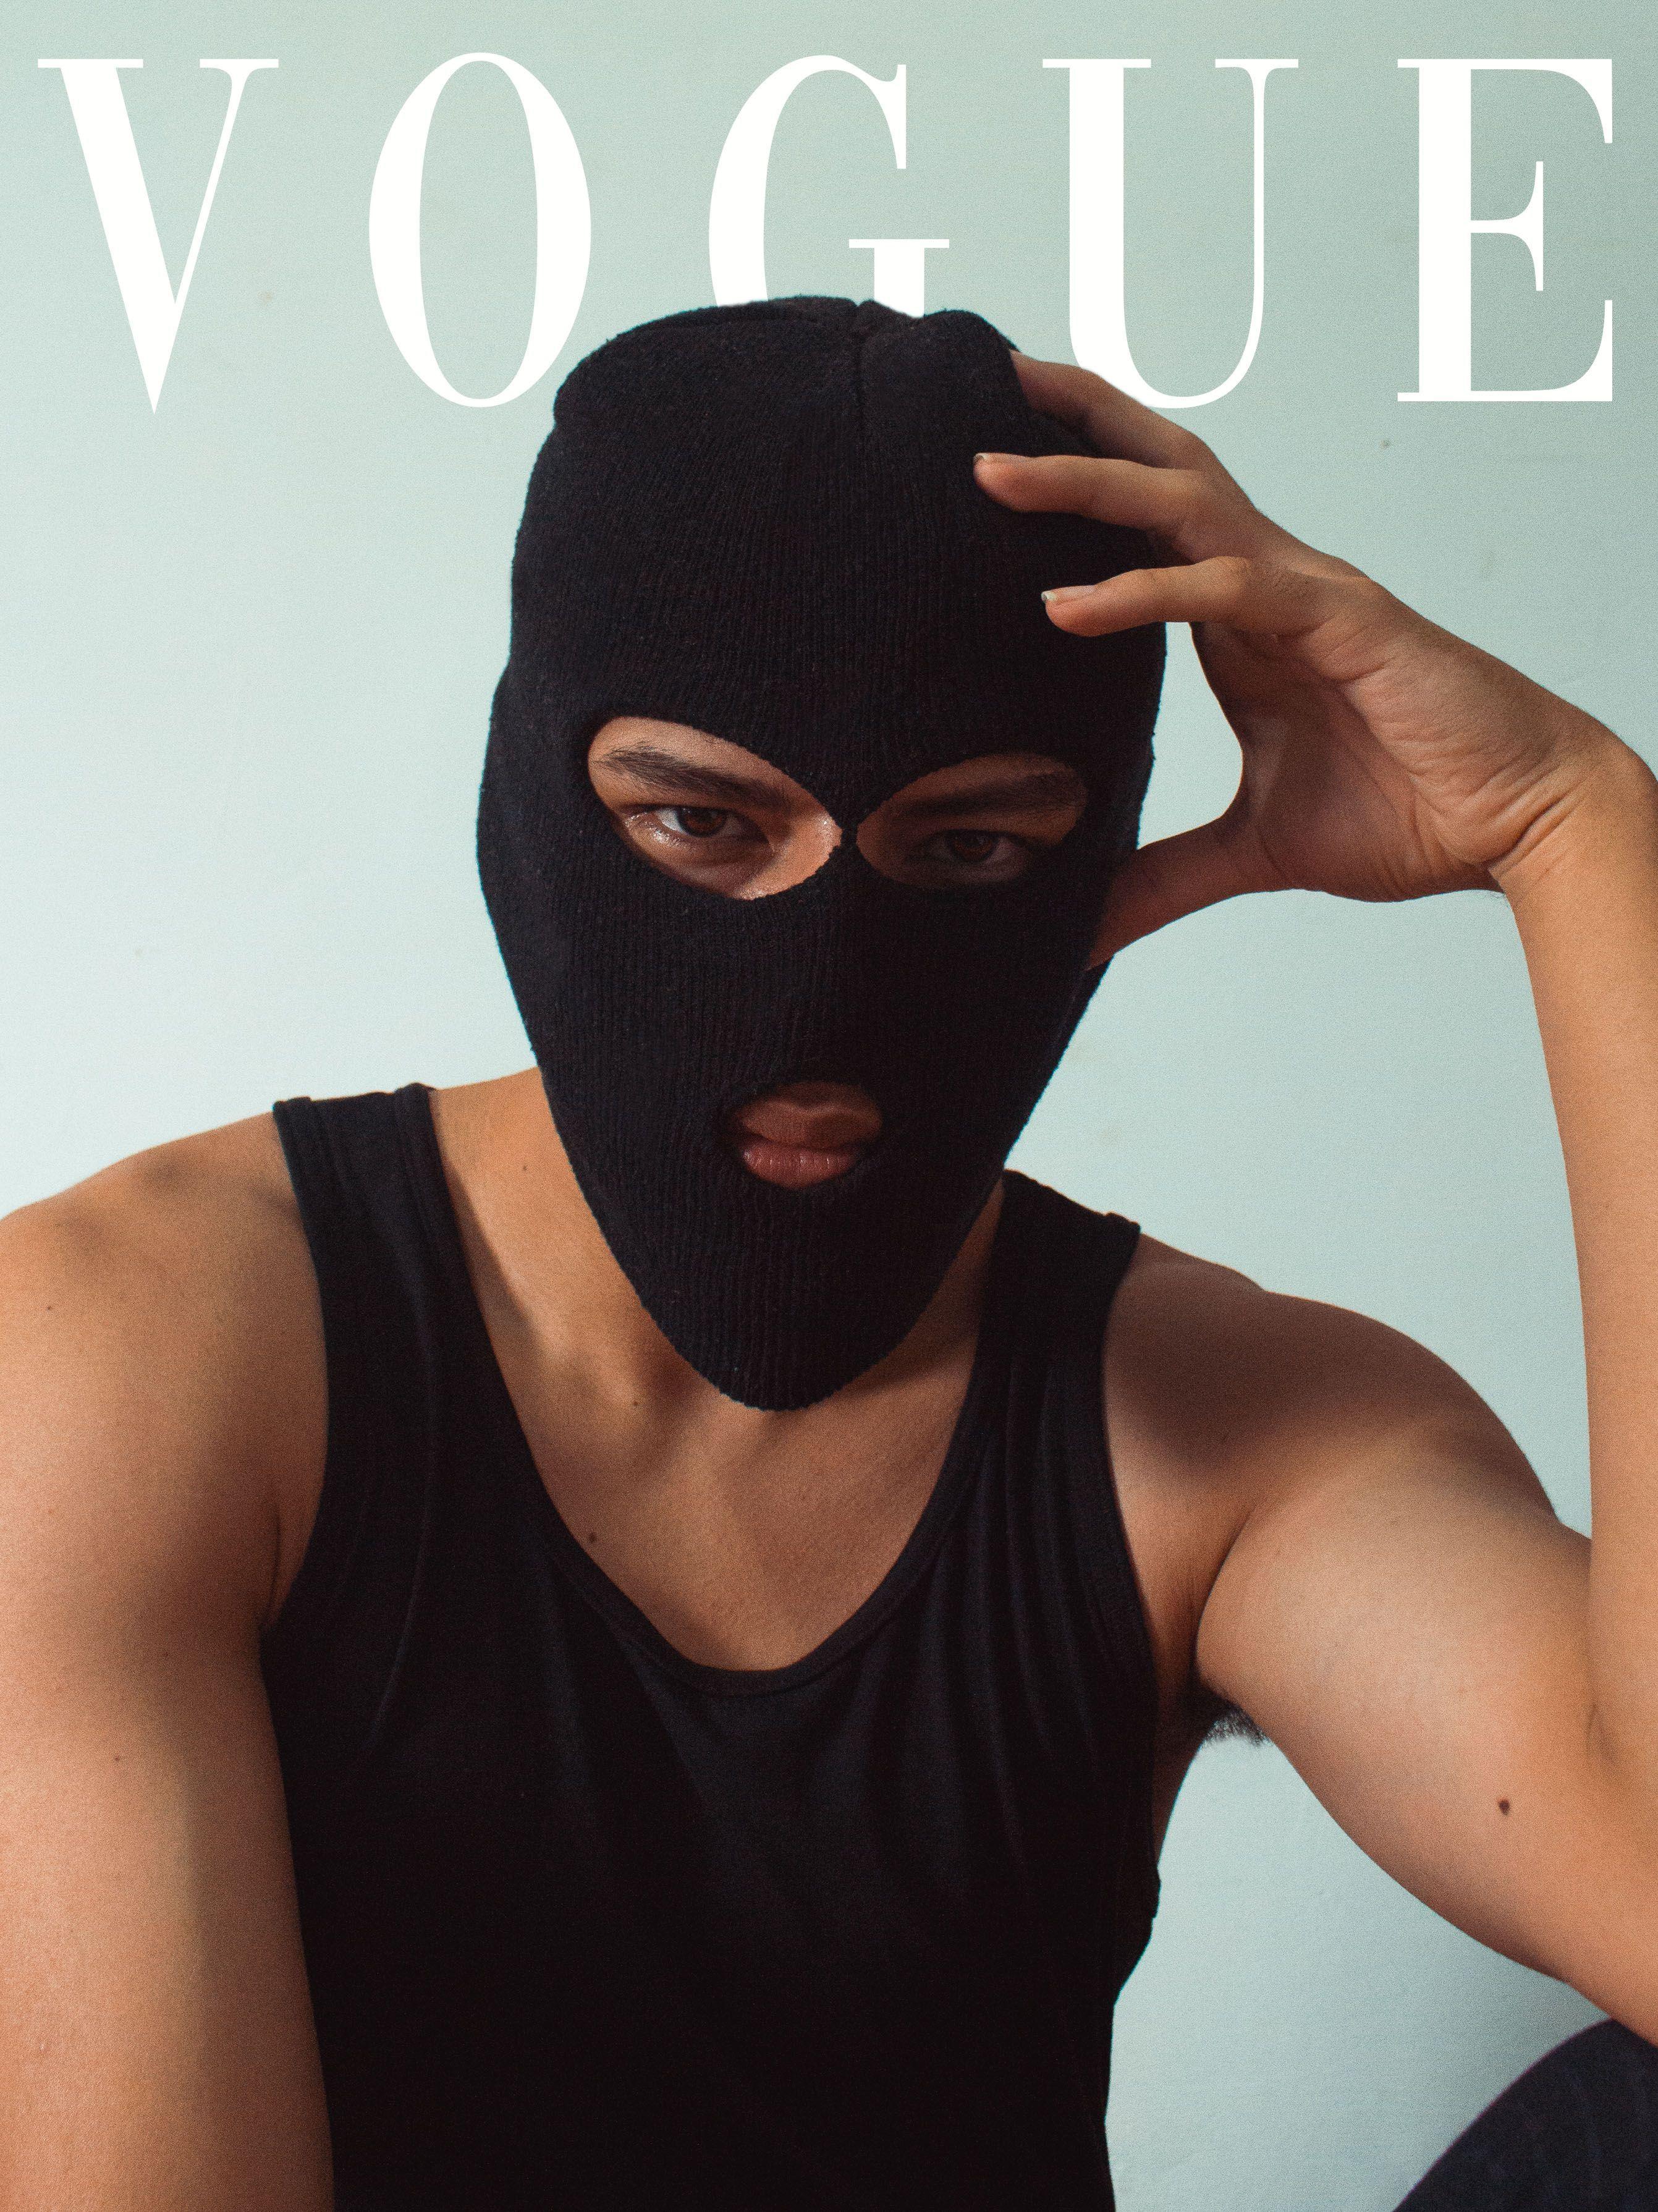 Vogue Challenge Tiktok Vogue Aesthetic Photo Challenges